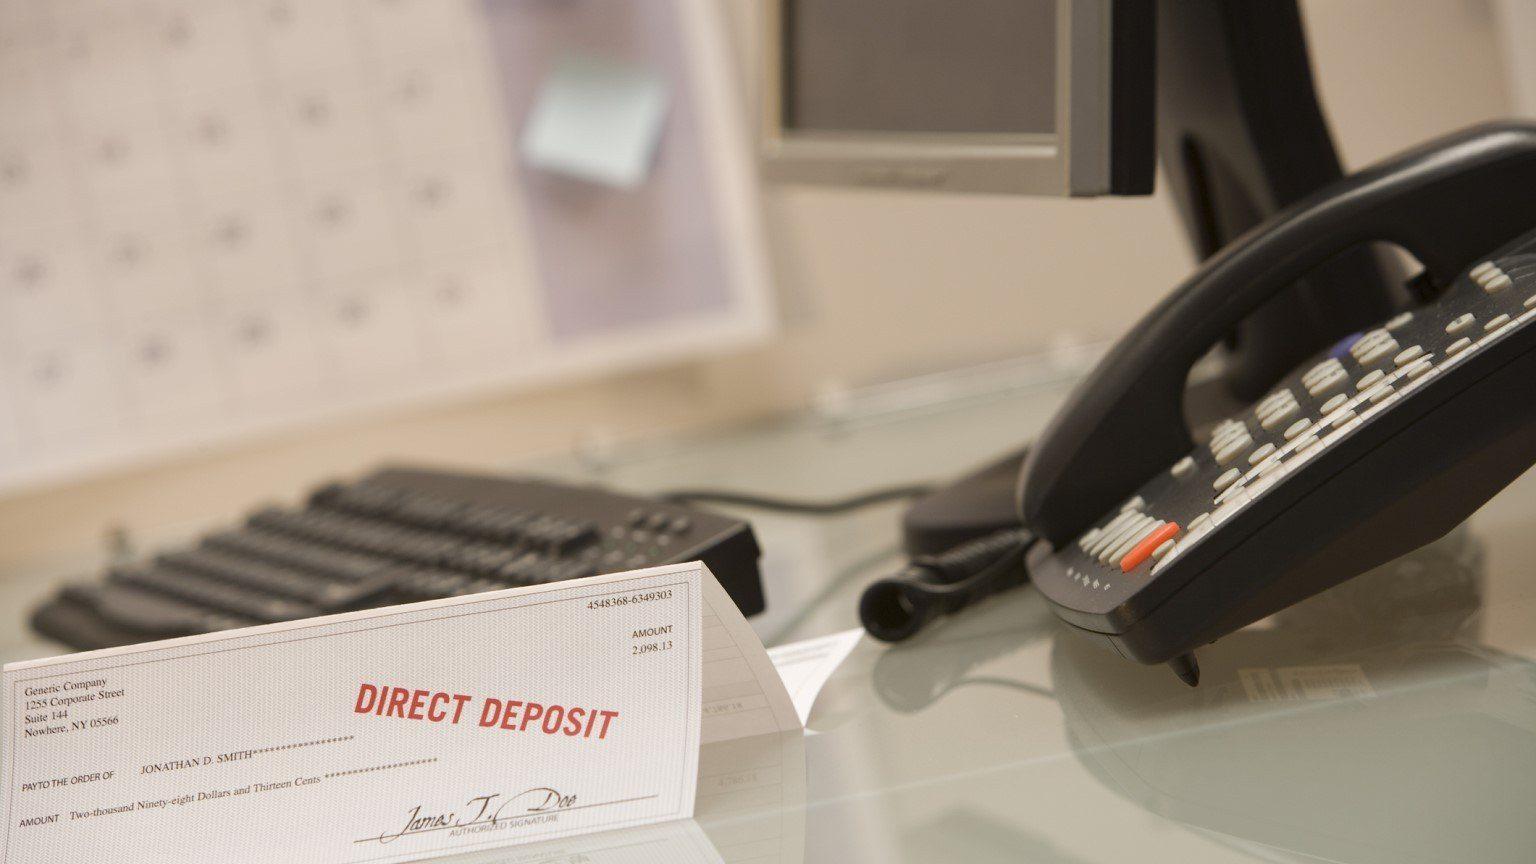 Direct deposit check on desk